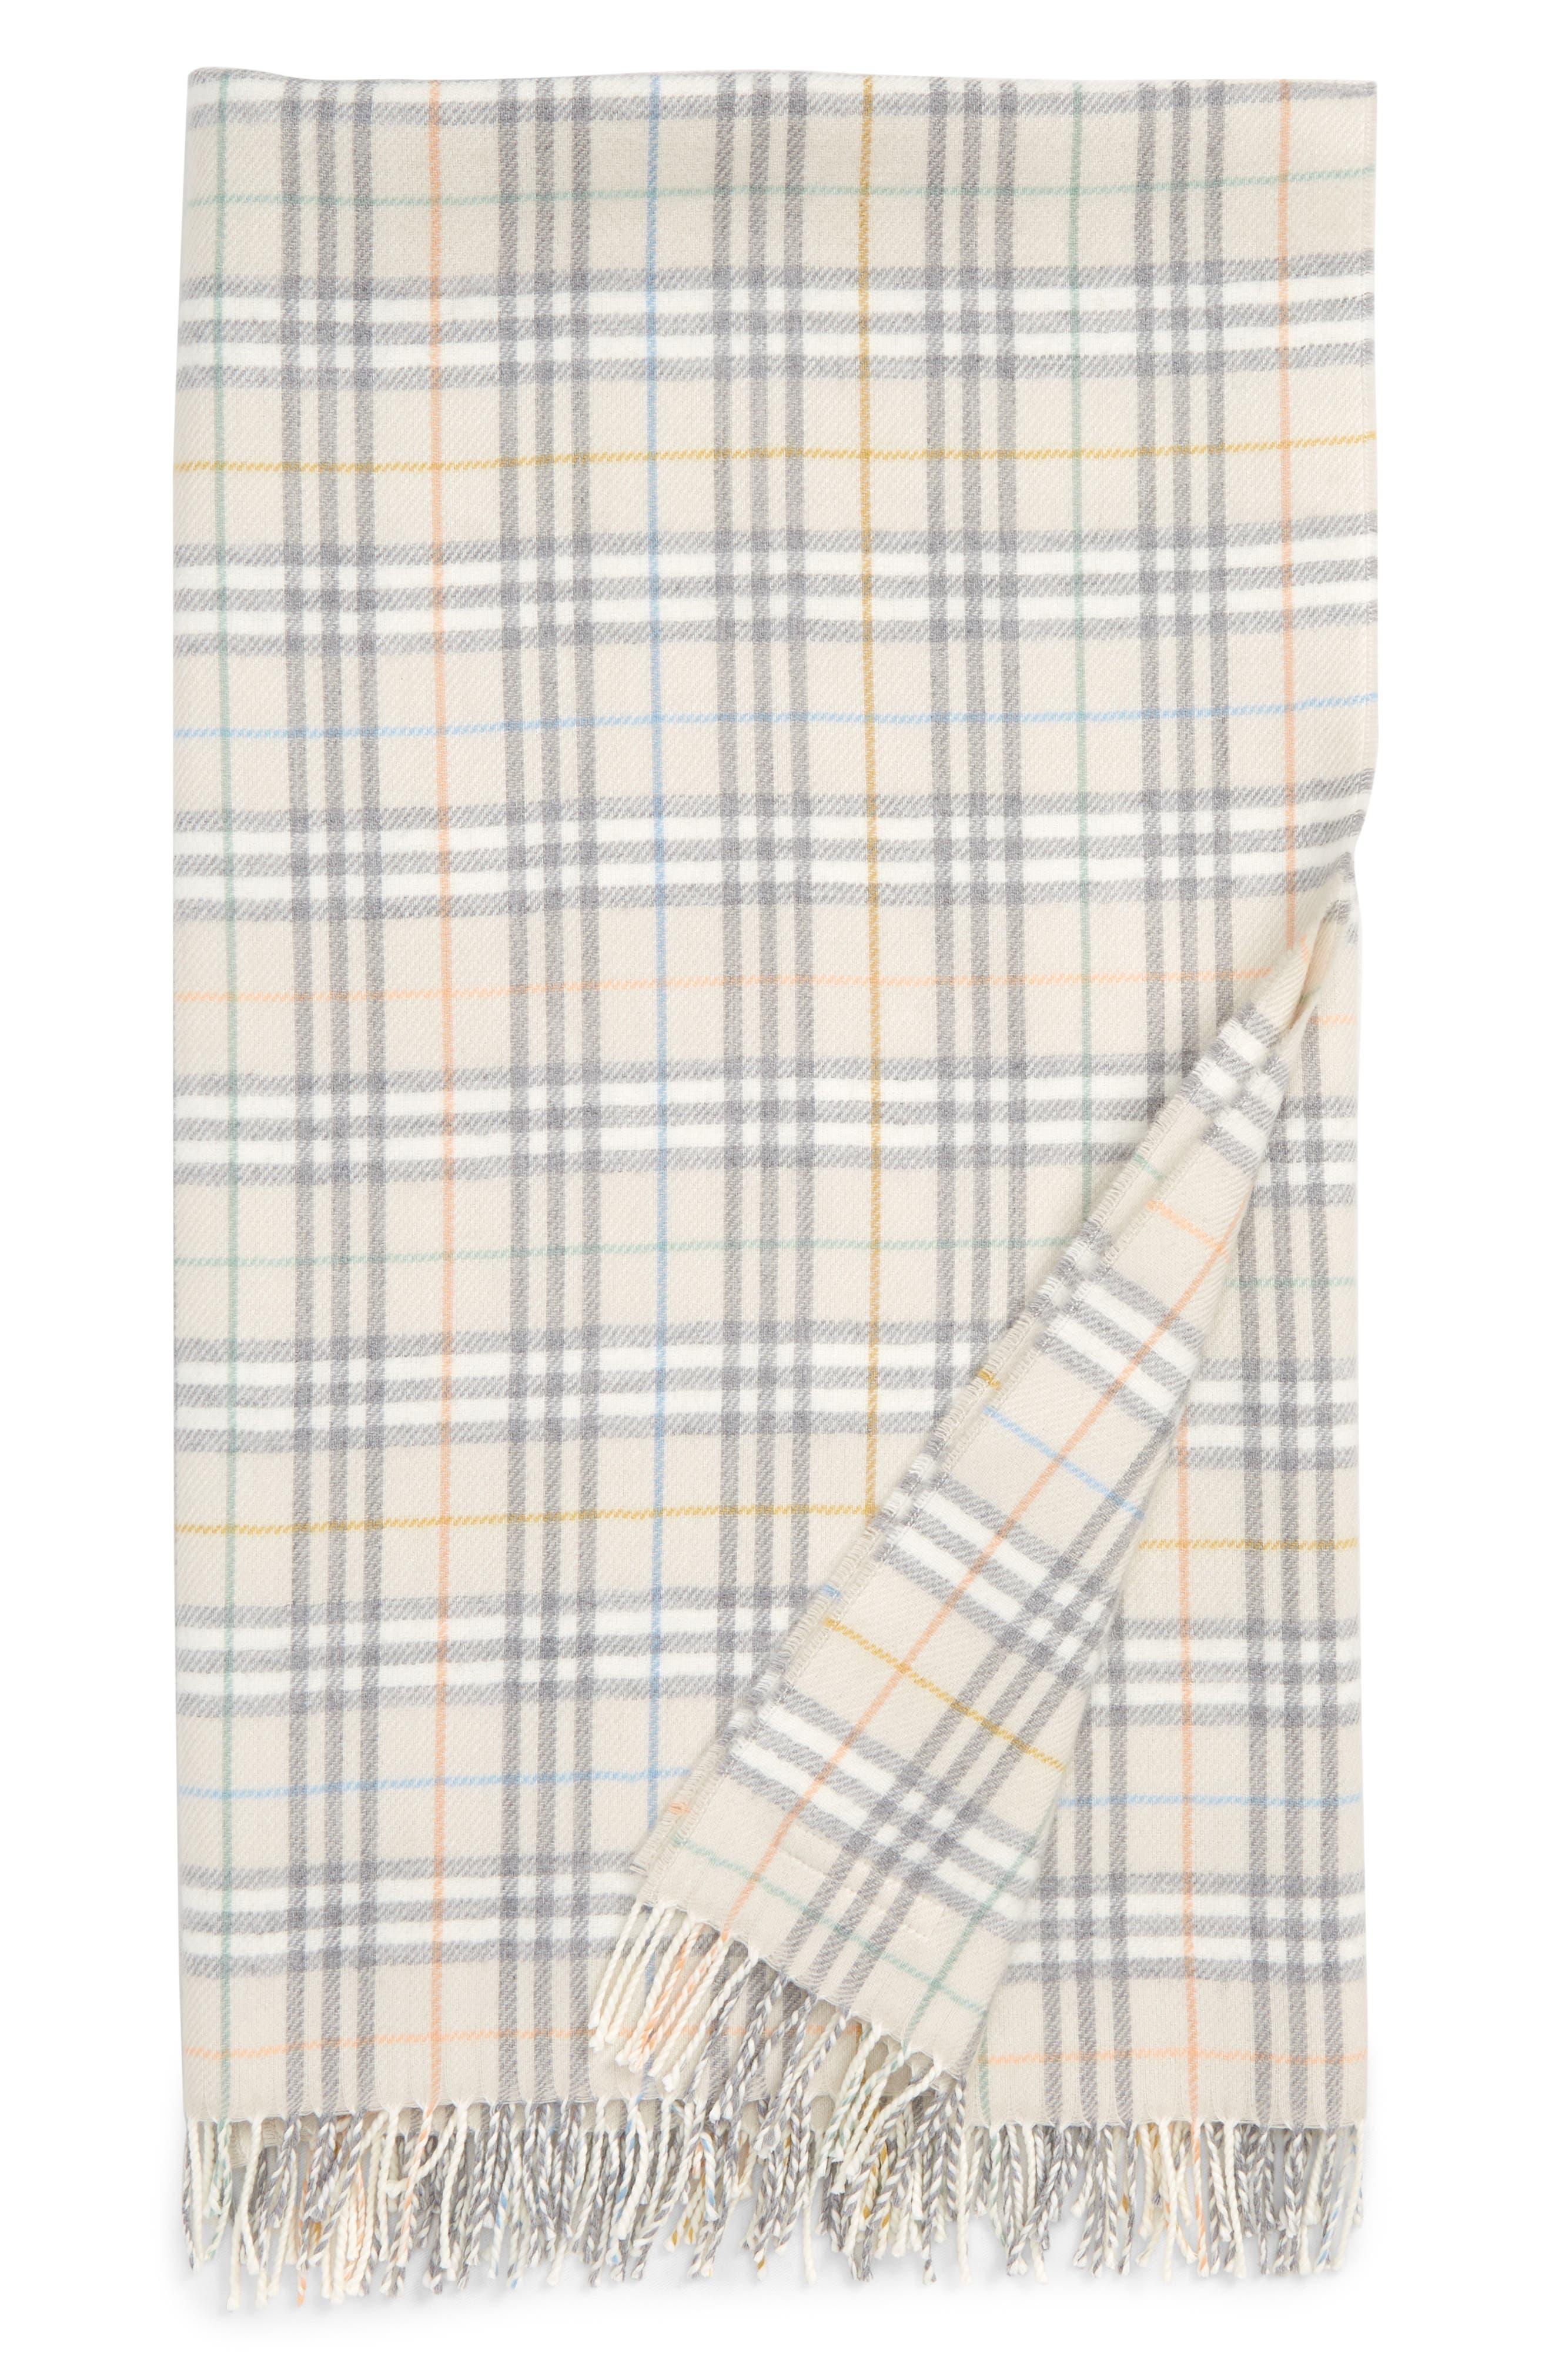 Merino Wool Blanket,                             Main thumbnail 1, color,                             IVORY IP CHK